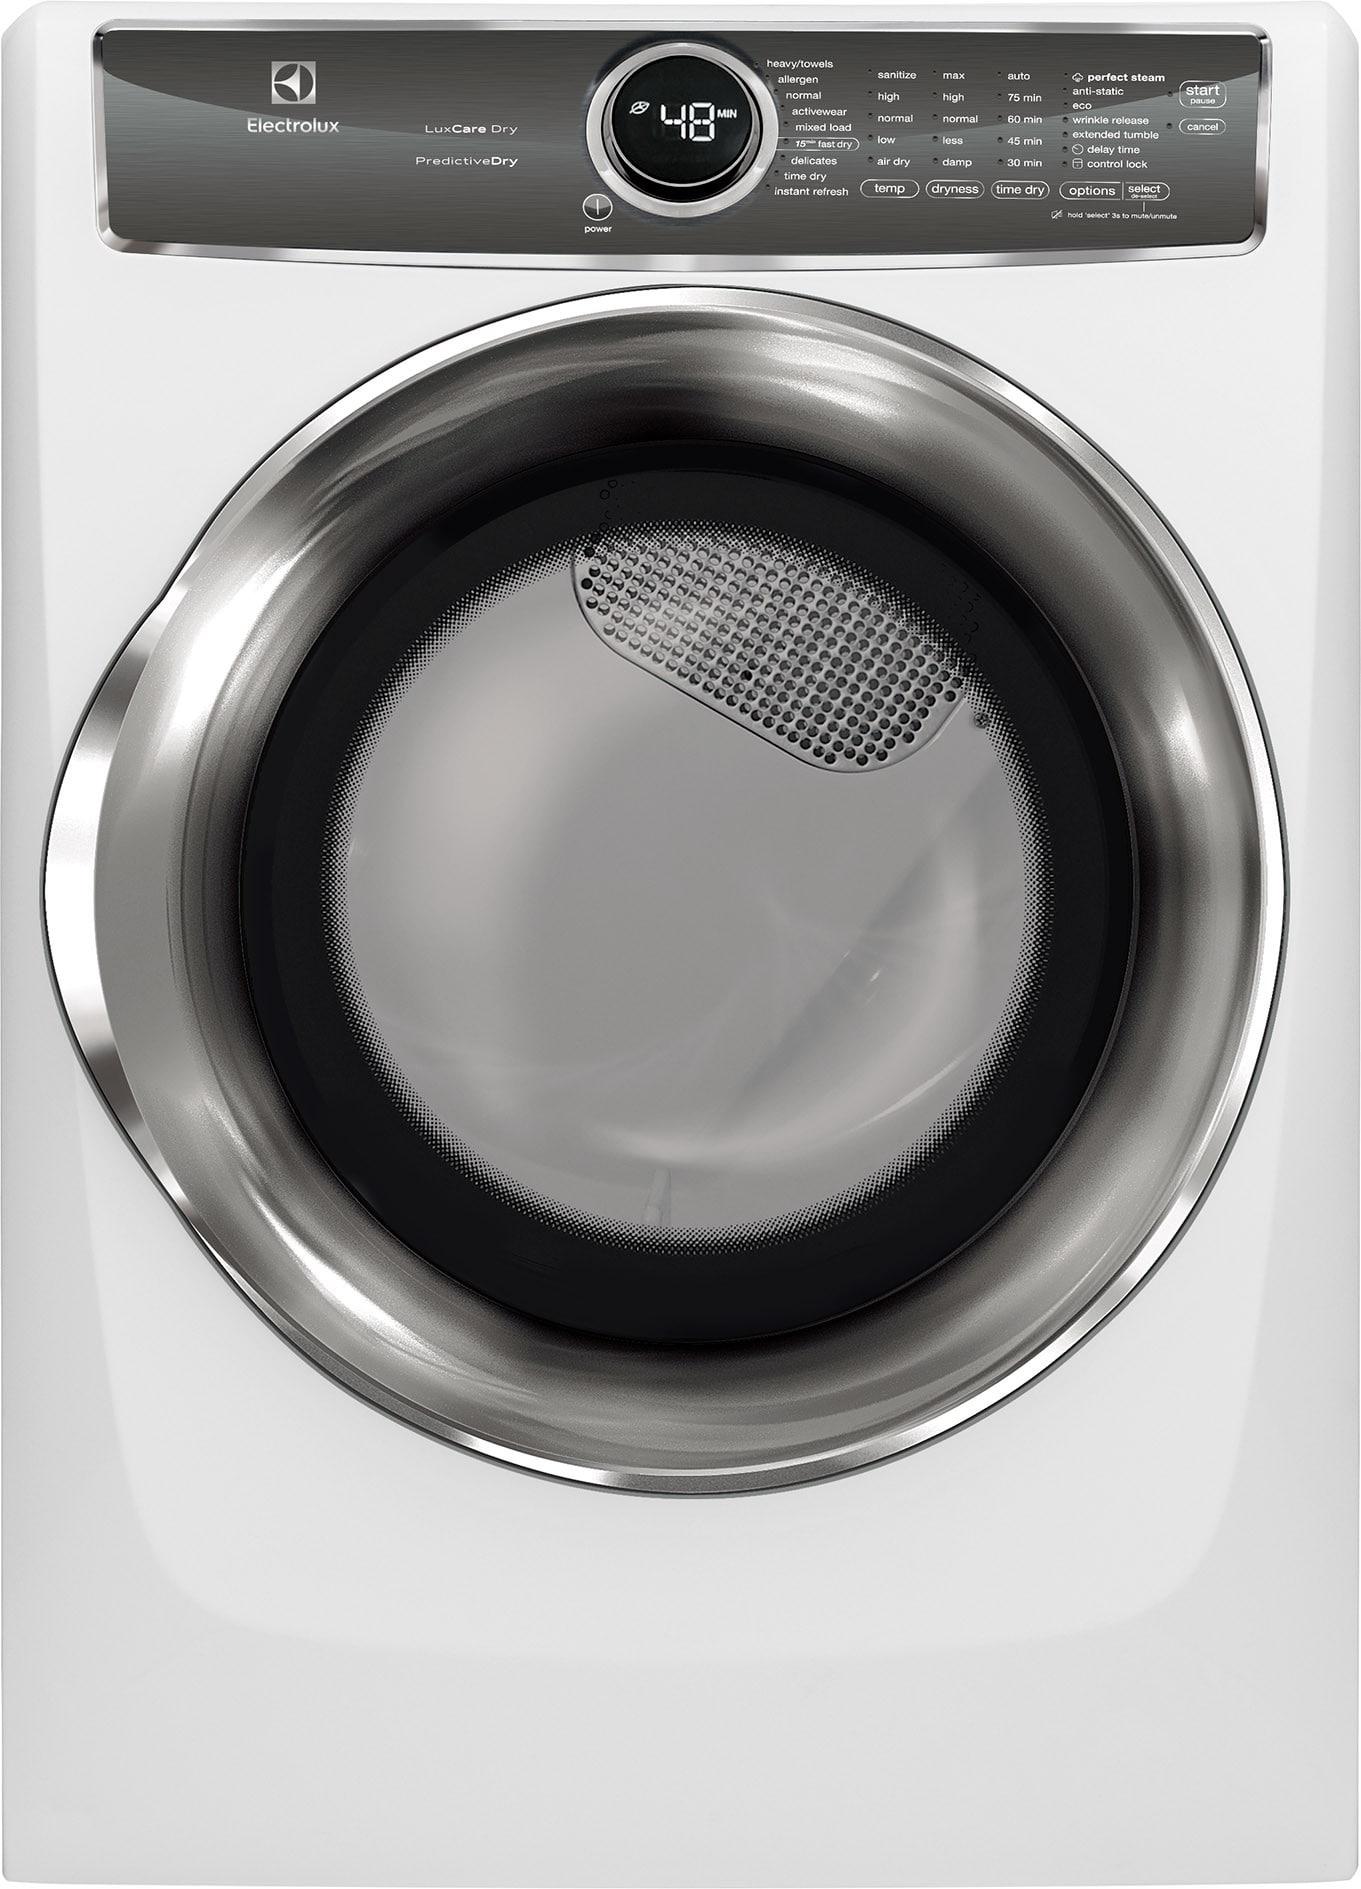 load op d ft details prod sharpen white compact jsp front wid hei electrolux product ventless cu dryer pedestal